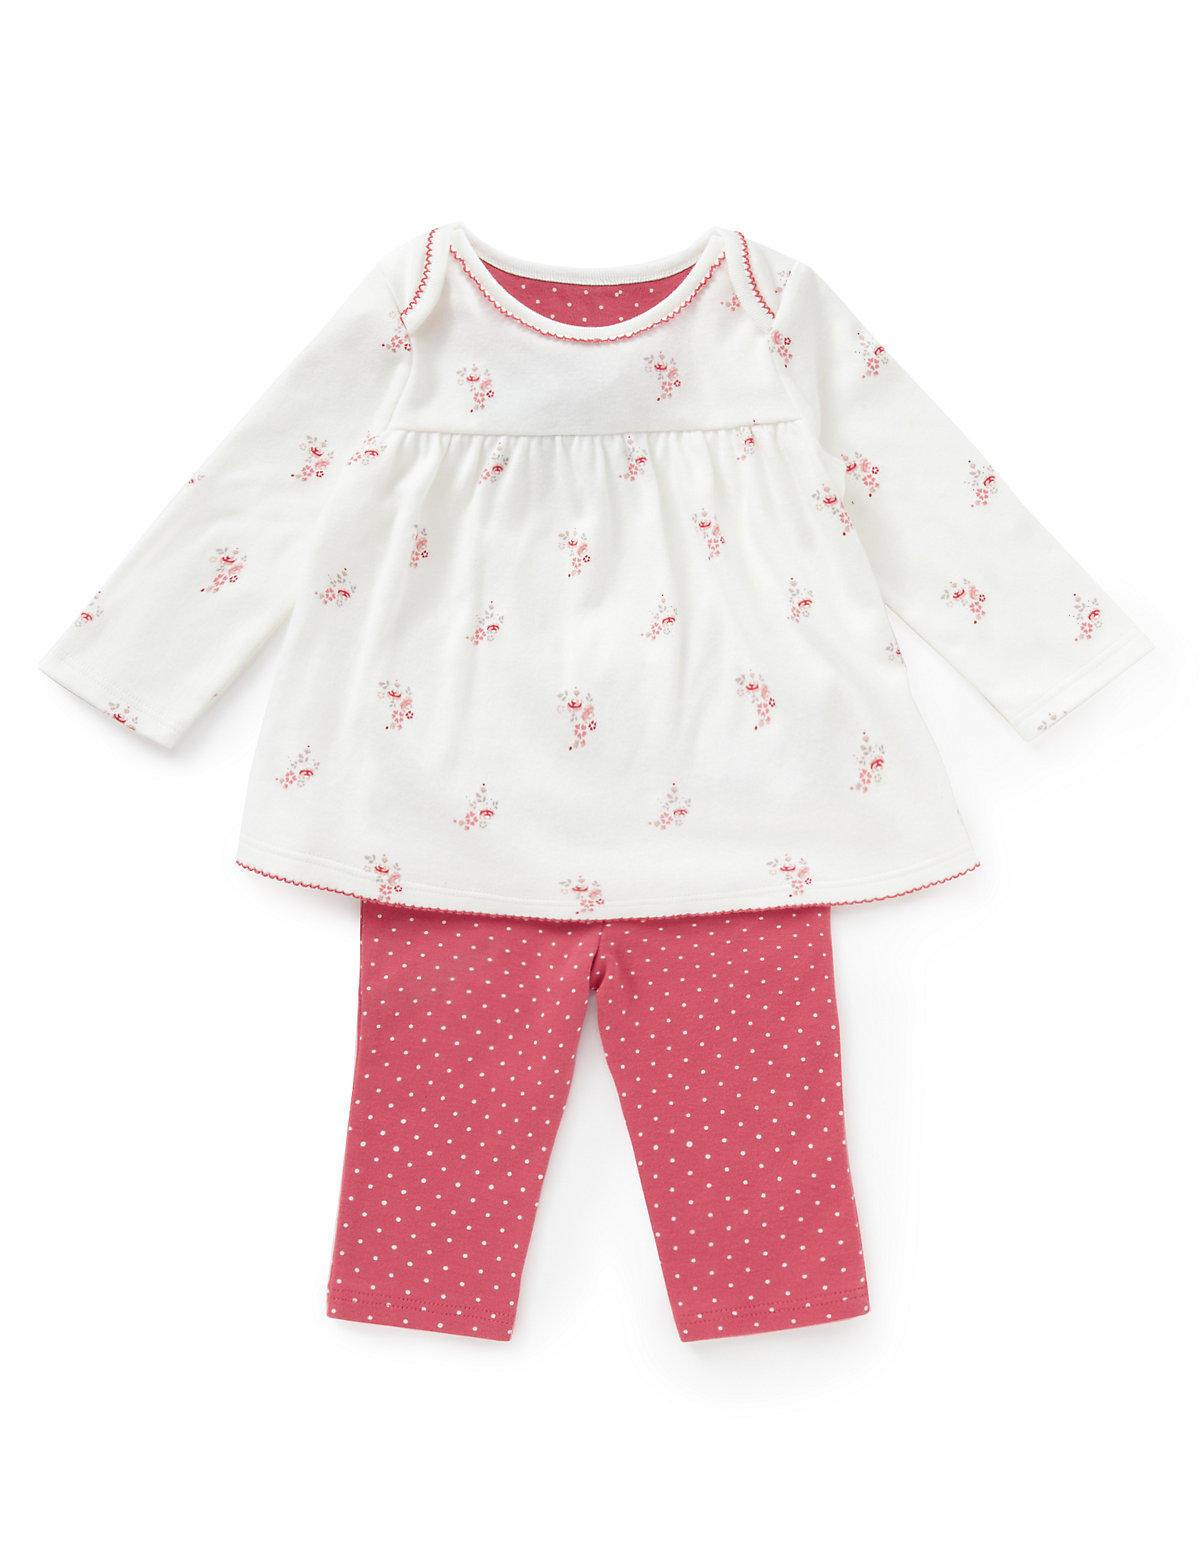 2 Piece Pure Cotton Floral Tunic & Leggings Outfit